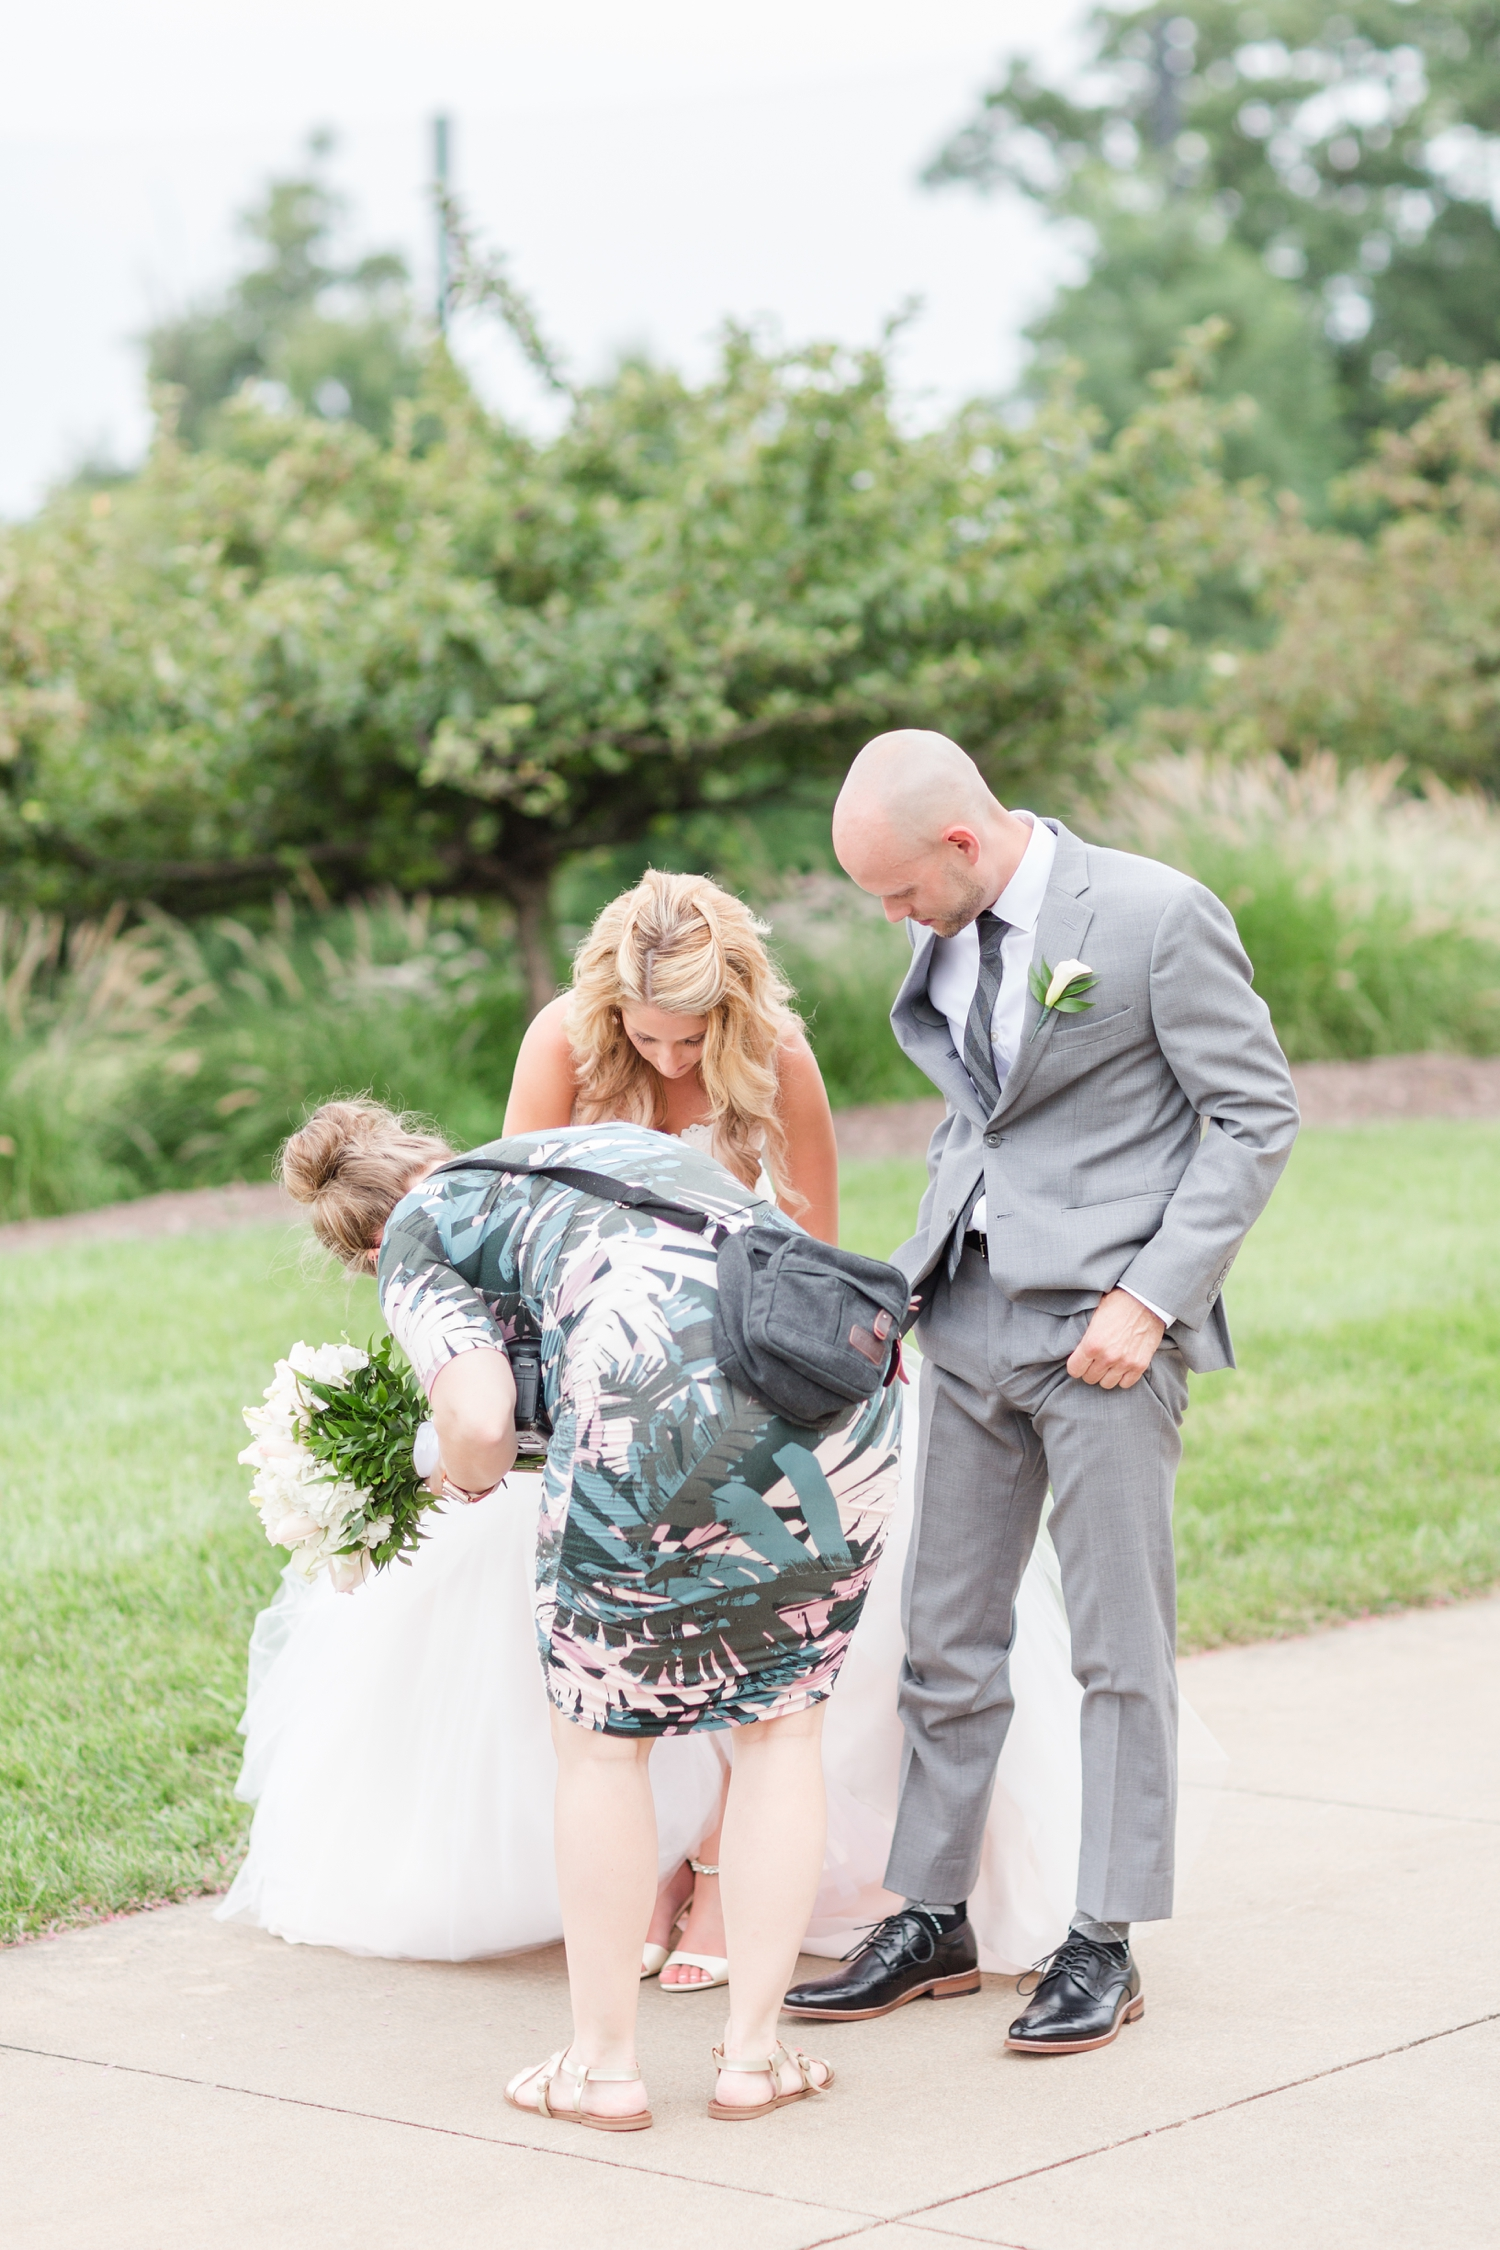 Wood Wedding 3-Bride 7 Groom Portraits-274_Maryland-Virginia-Wedding-Photographer-Behind-The-Scenes-anna-grace-photography-photo.jpg